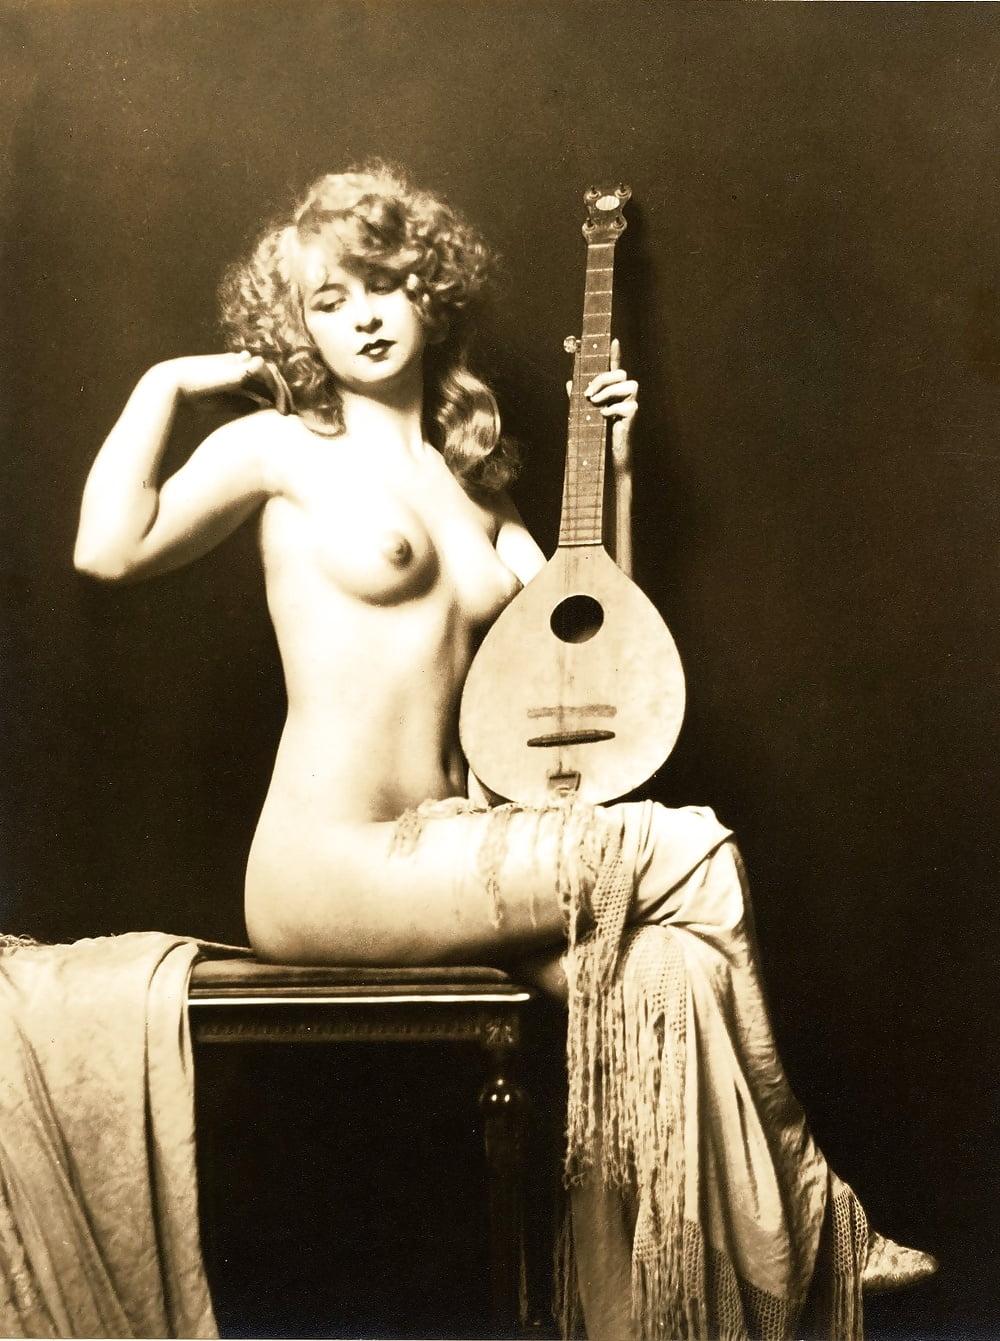 femme-vintage-musician-female-nude-titti-naked-women